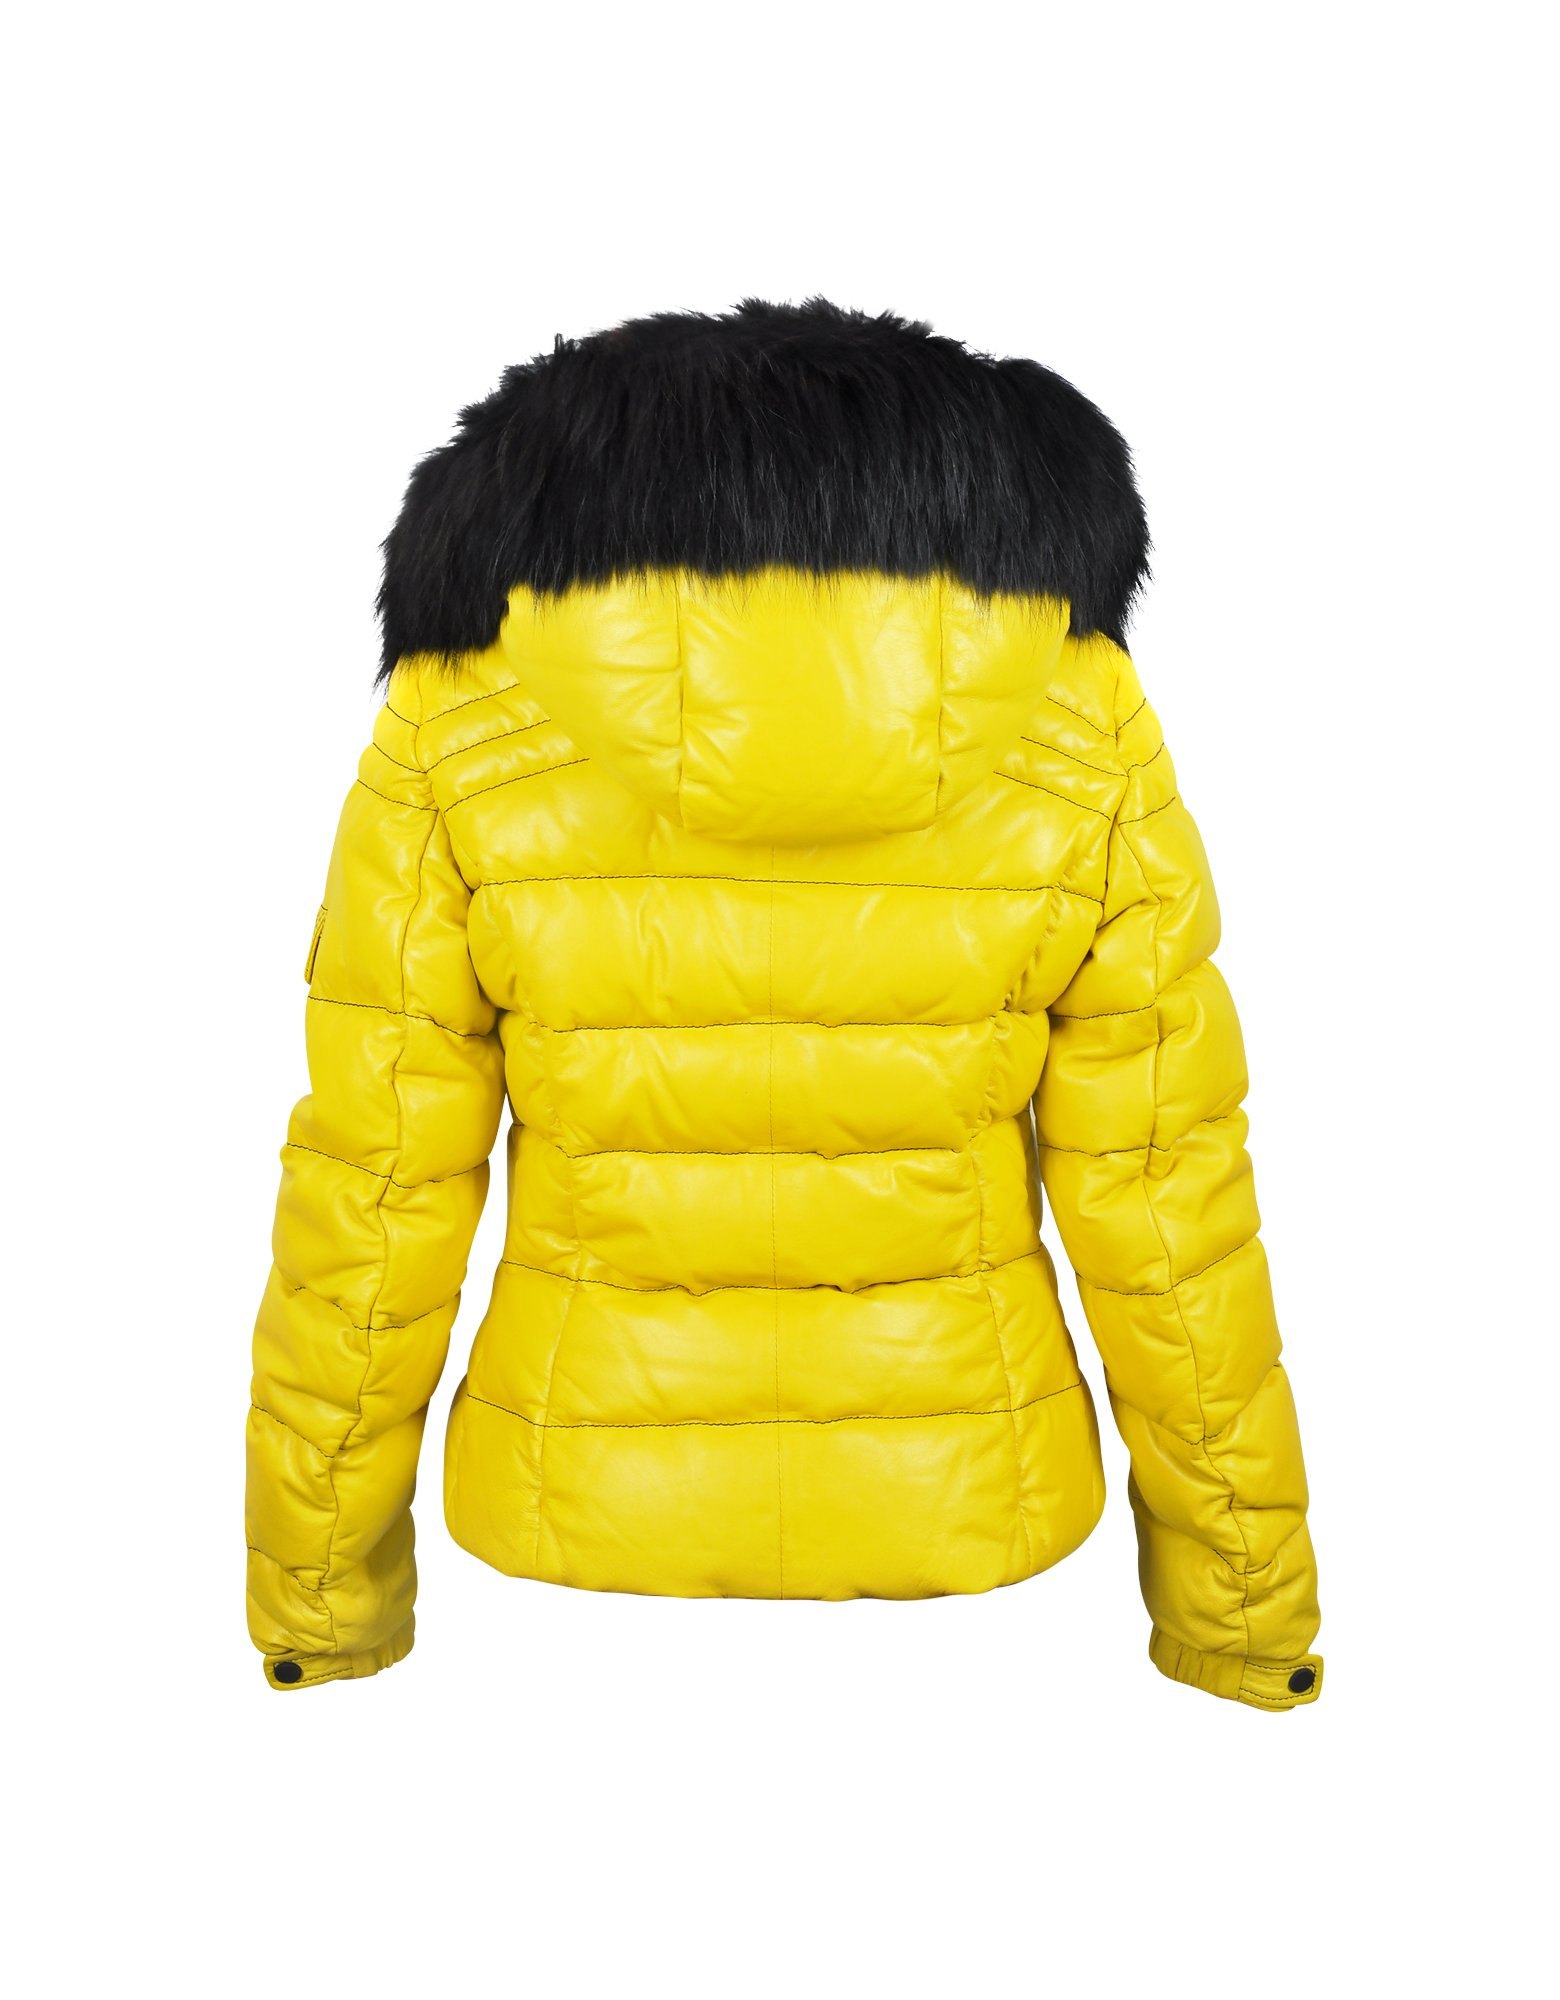 lyst  detachable fur hood in yellow